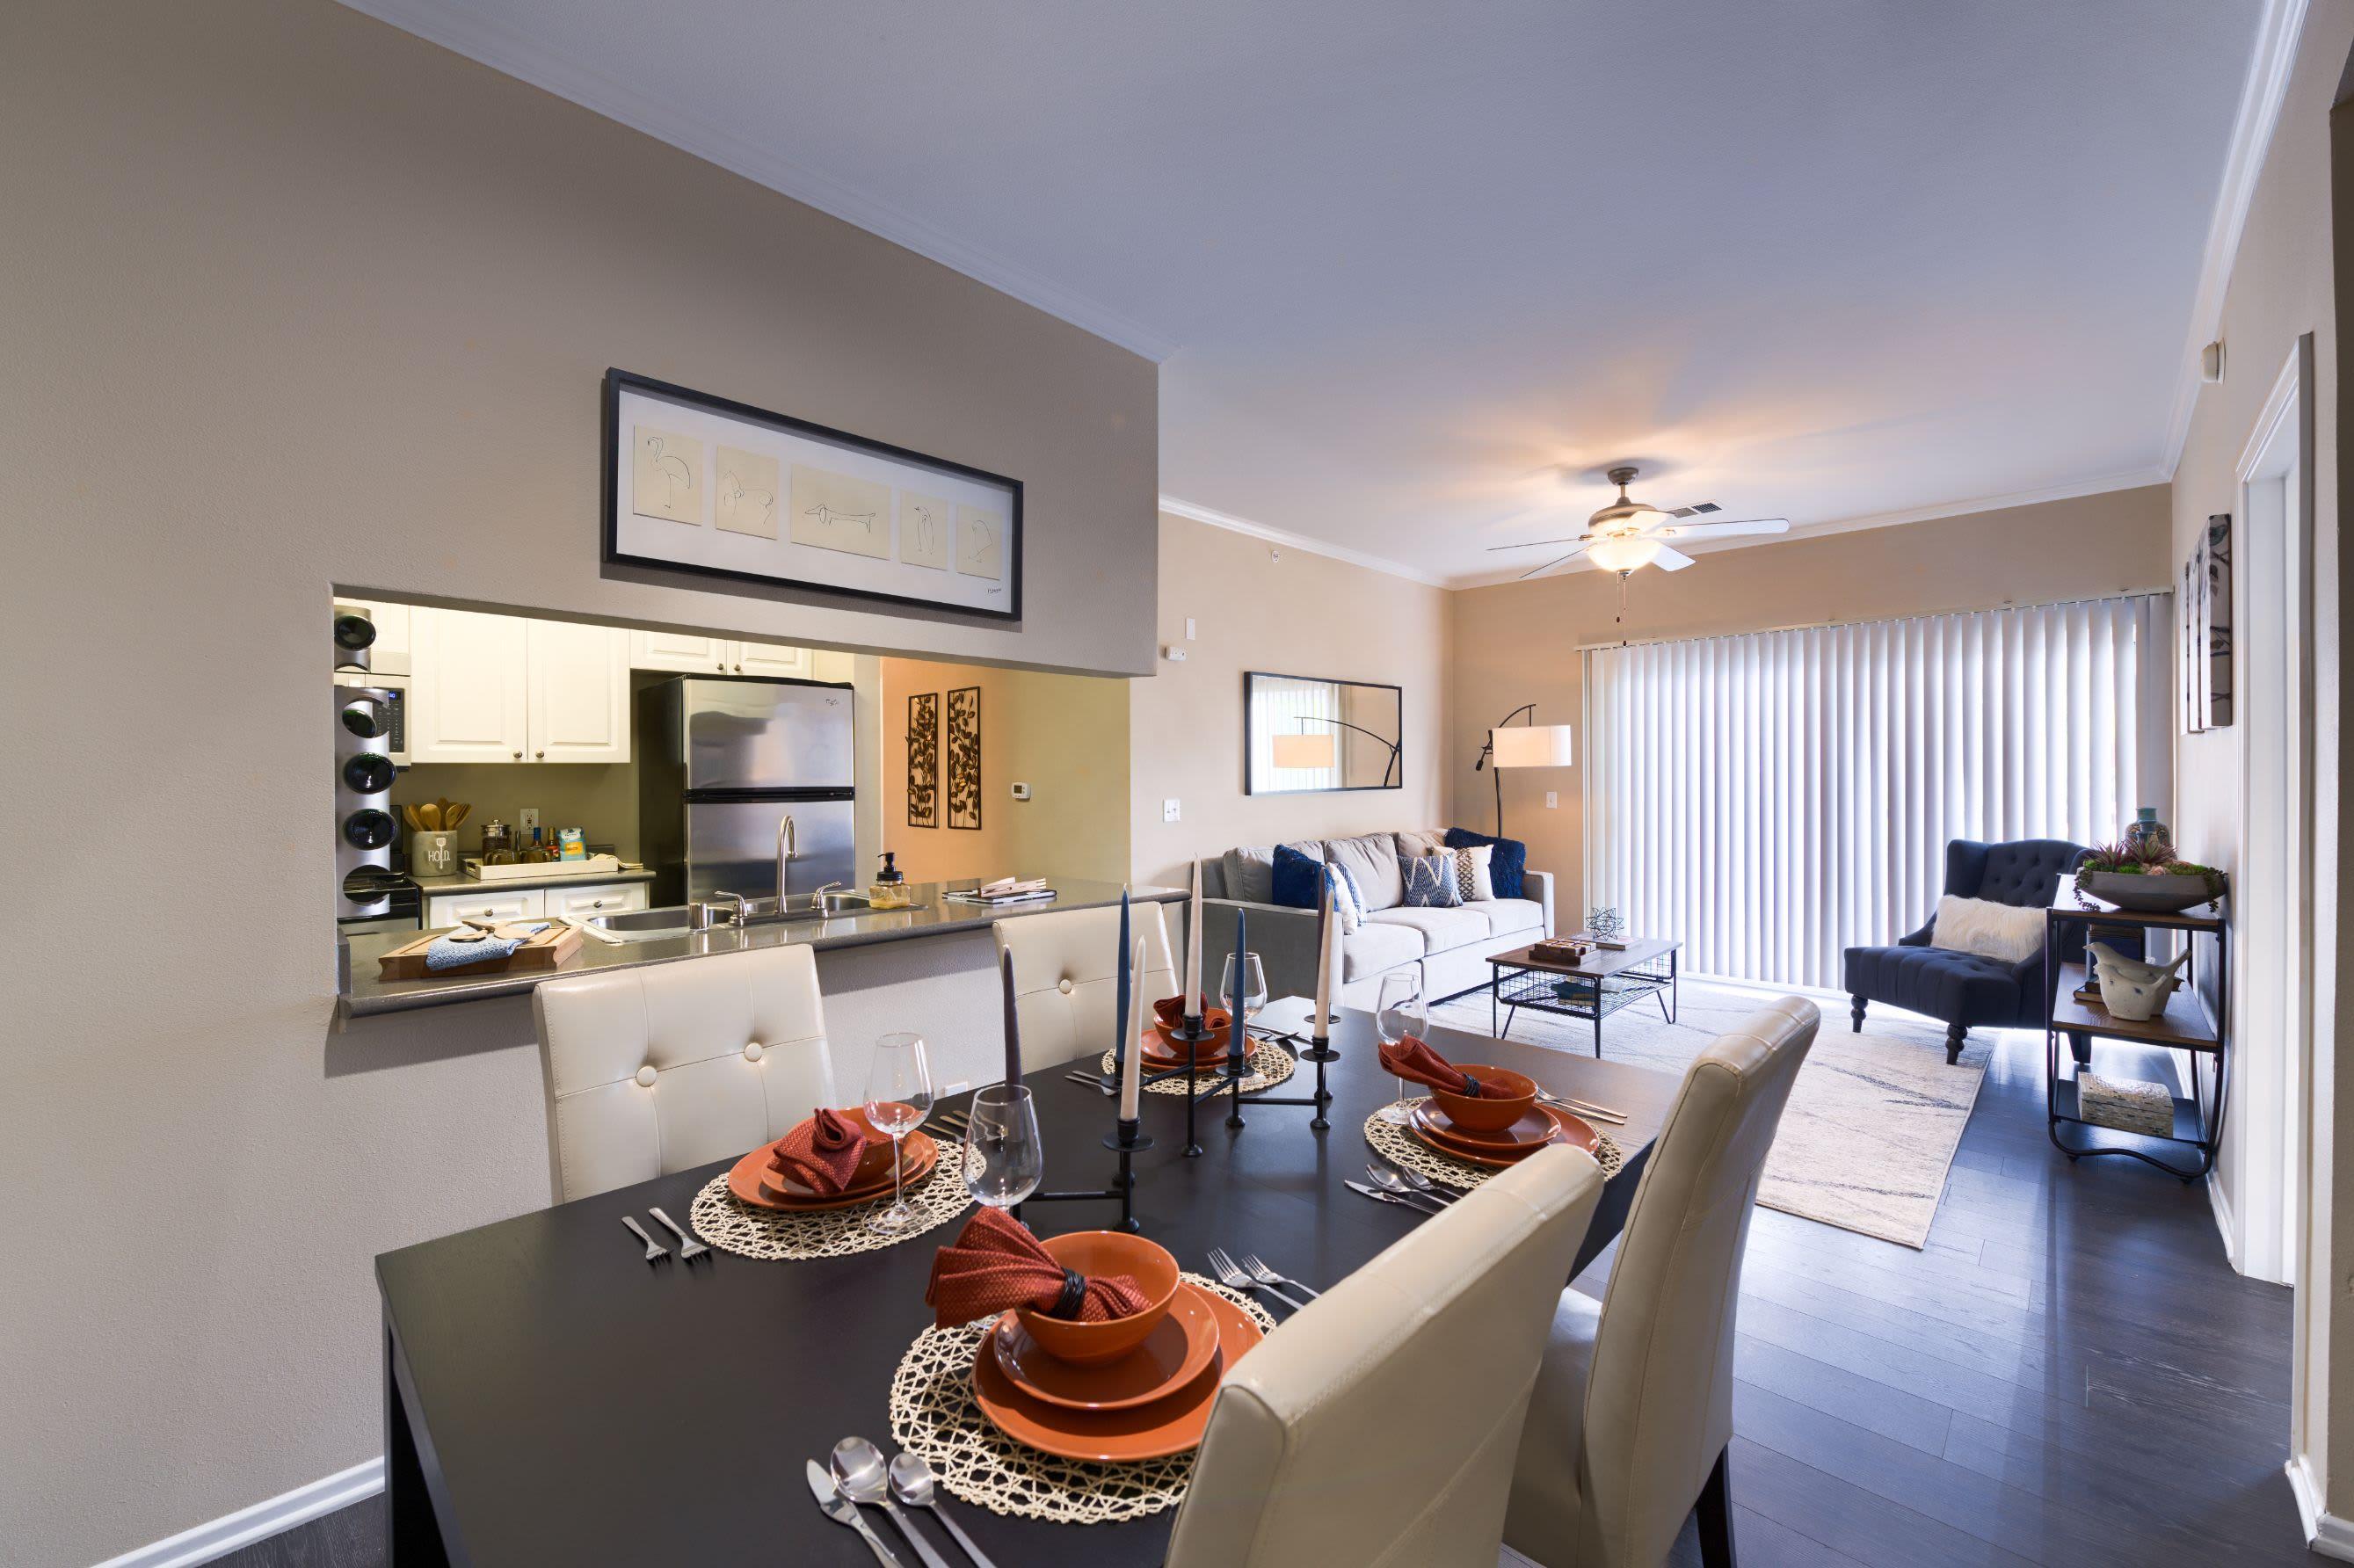 24-Hour Maintenance Guarantee at Whisper Creek Apartment Homes in Lakewood, Colorado